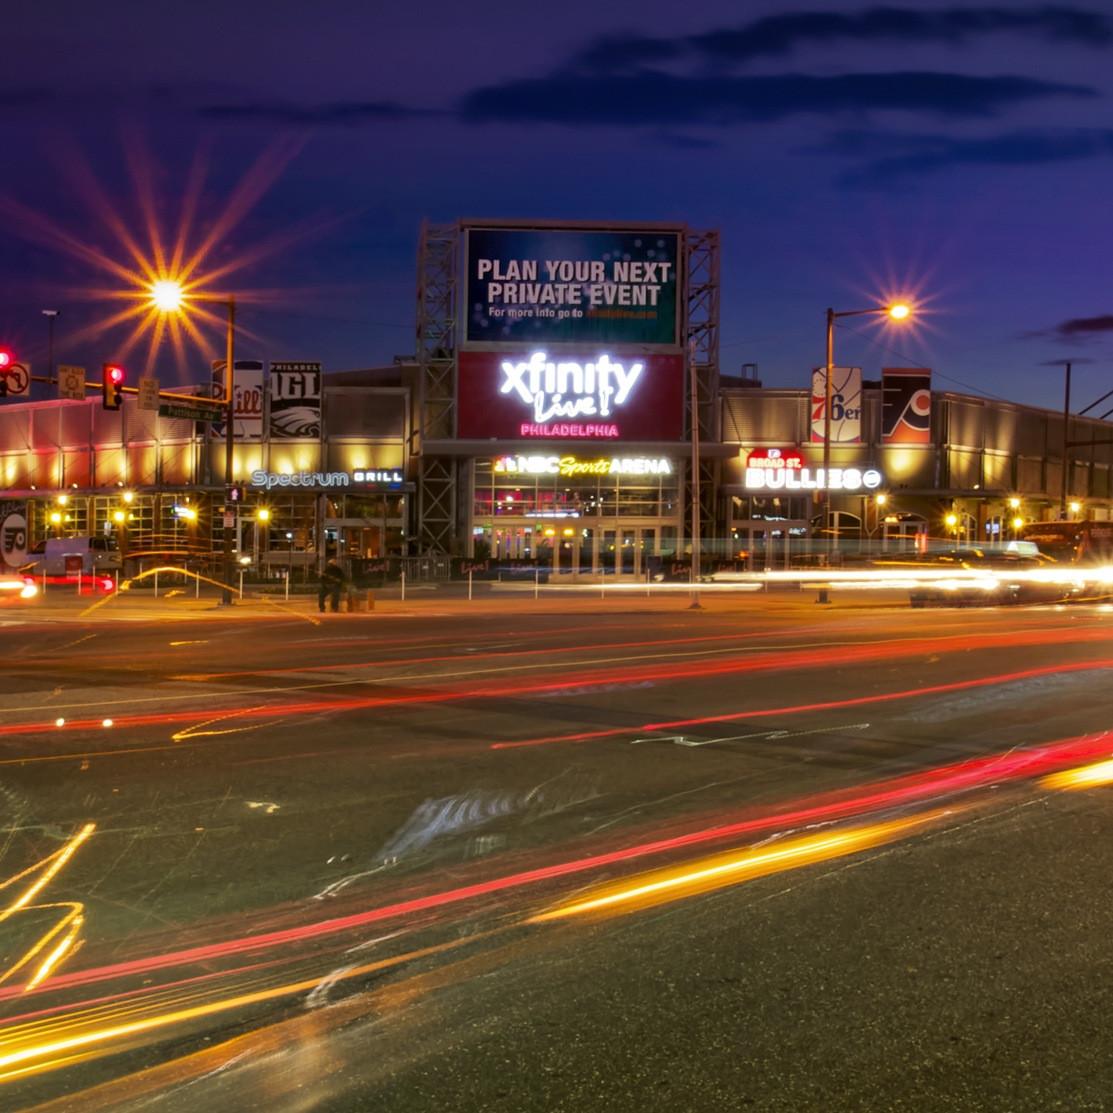 XFINITY Live! Philadelphia, Philadelphia, PA